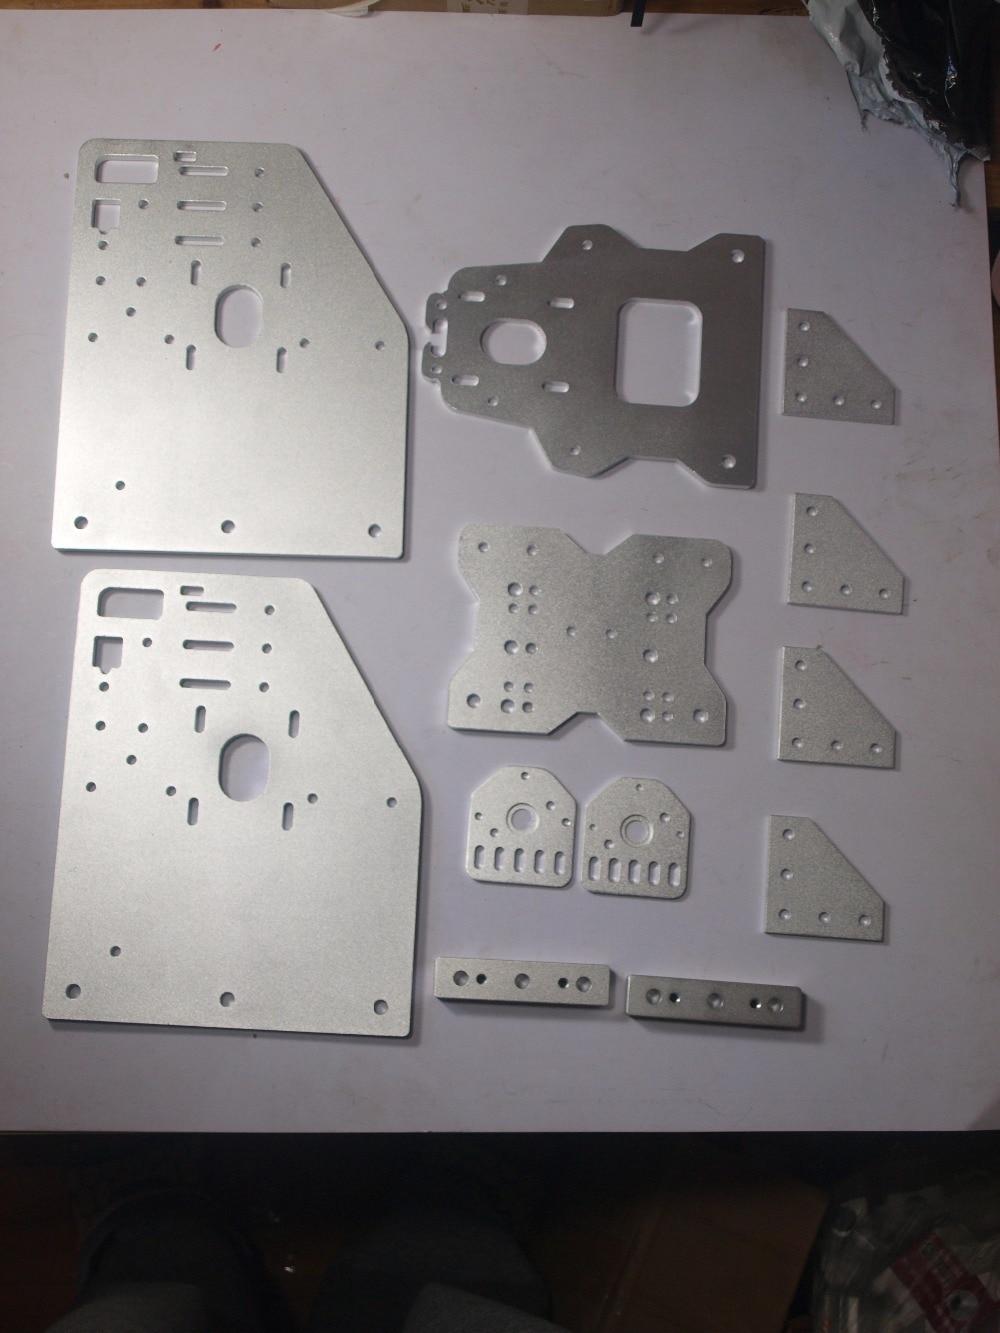 3d printer OX CNC machine parts CNC cut Aluminium Gantry plates kit angle joint plate back X axis/front plate 4-Wheel X Spacer ox cnc machine parts openbuilds ox cnc aluminum gantry plates with universal threaded rod plates